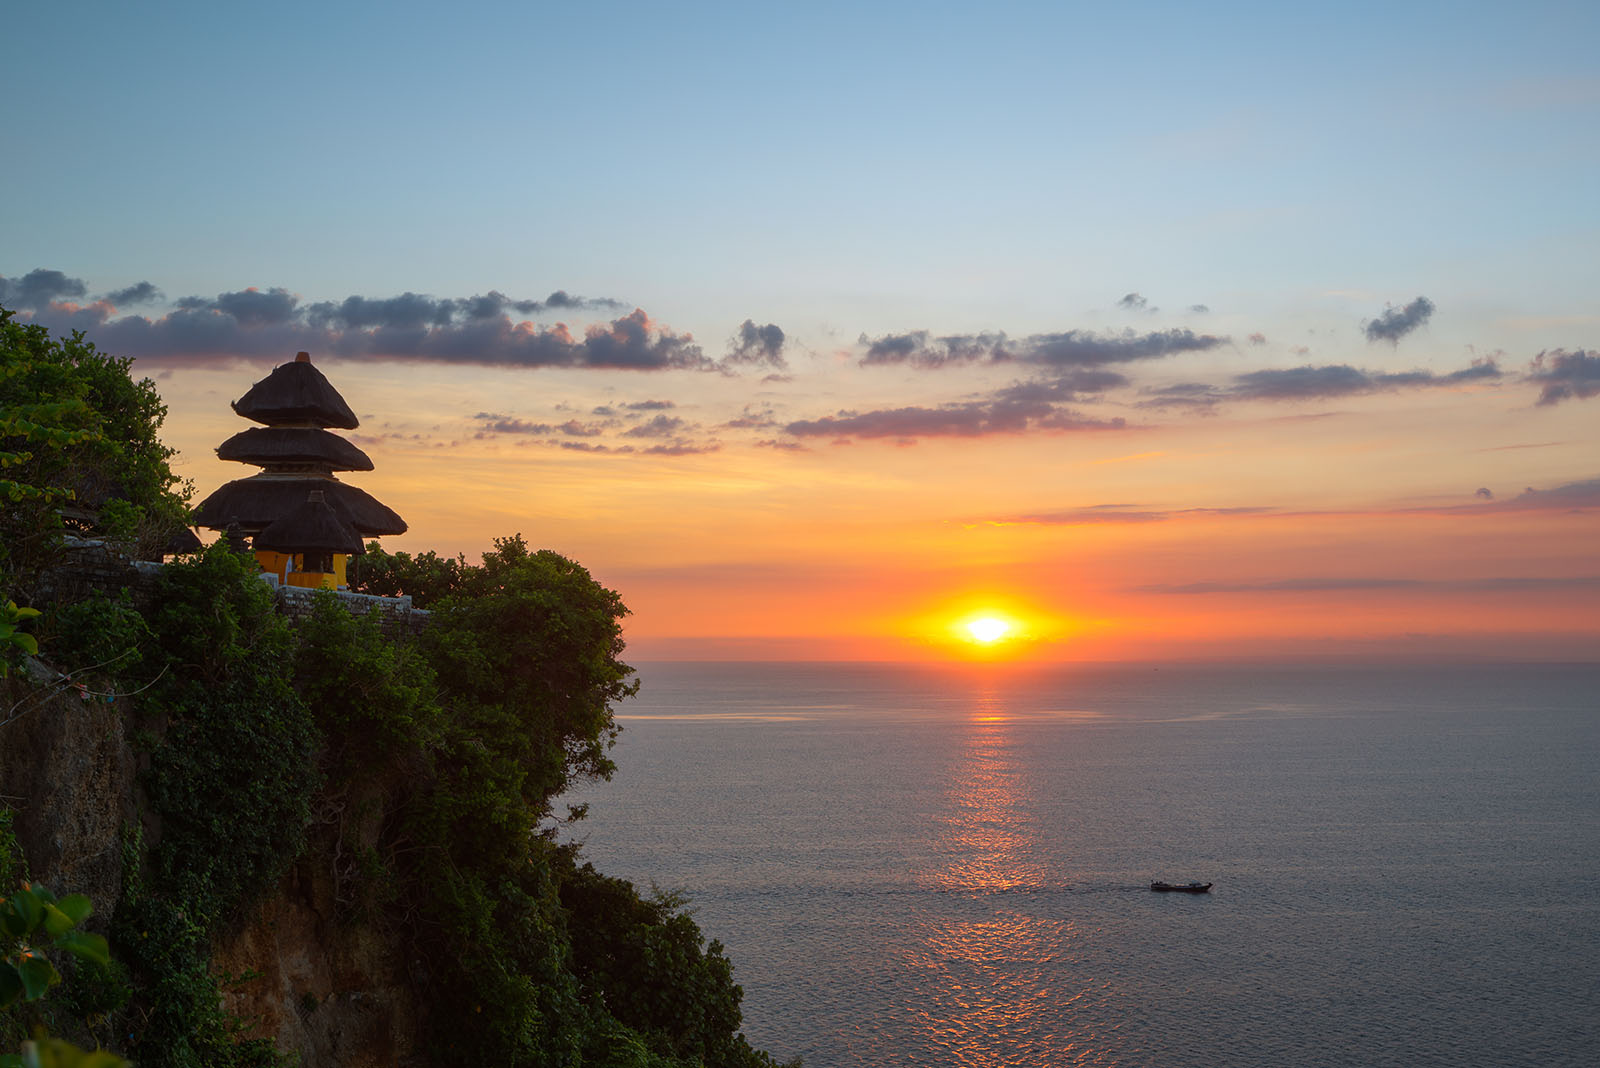 viaje a Bali, viajes a medida Bali, itinerario de viaje a Bali